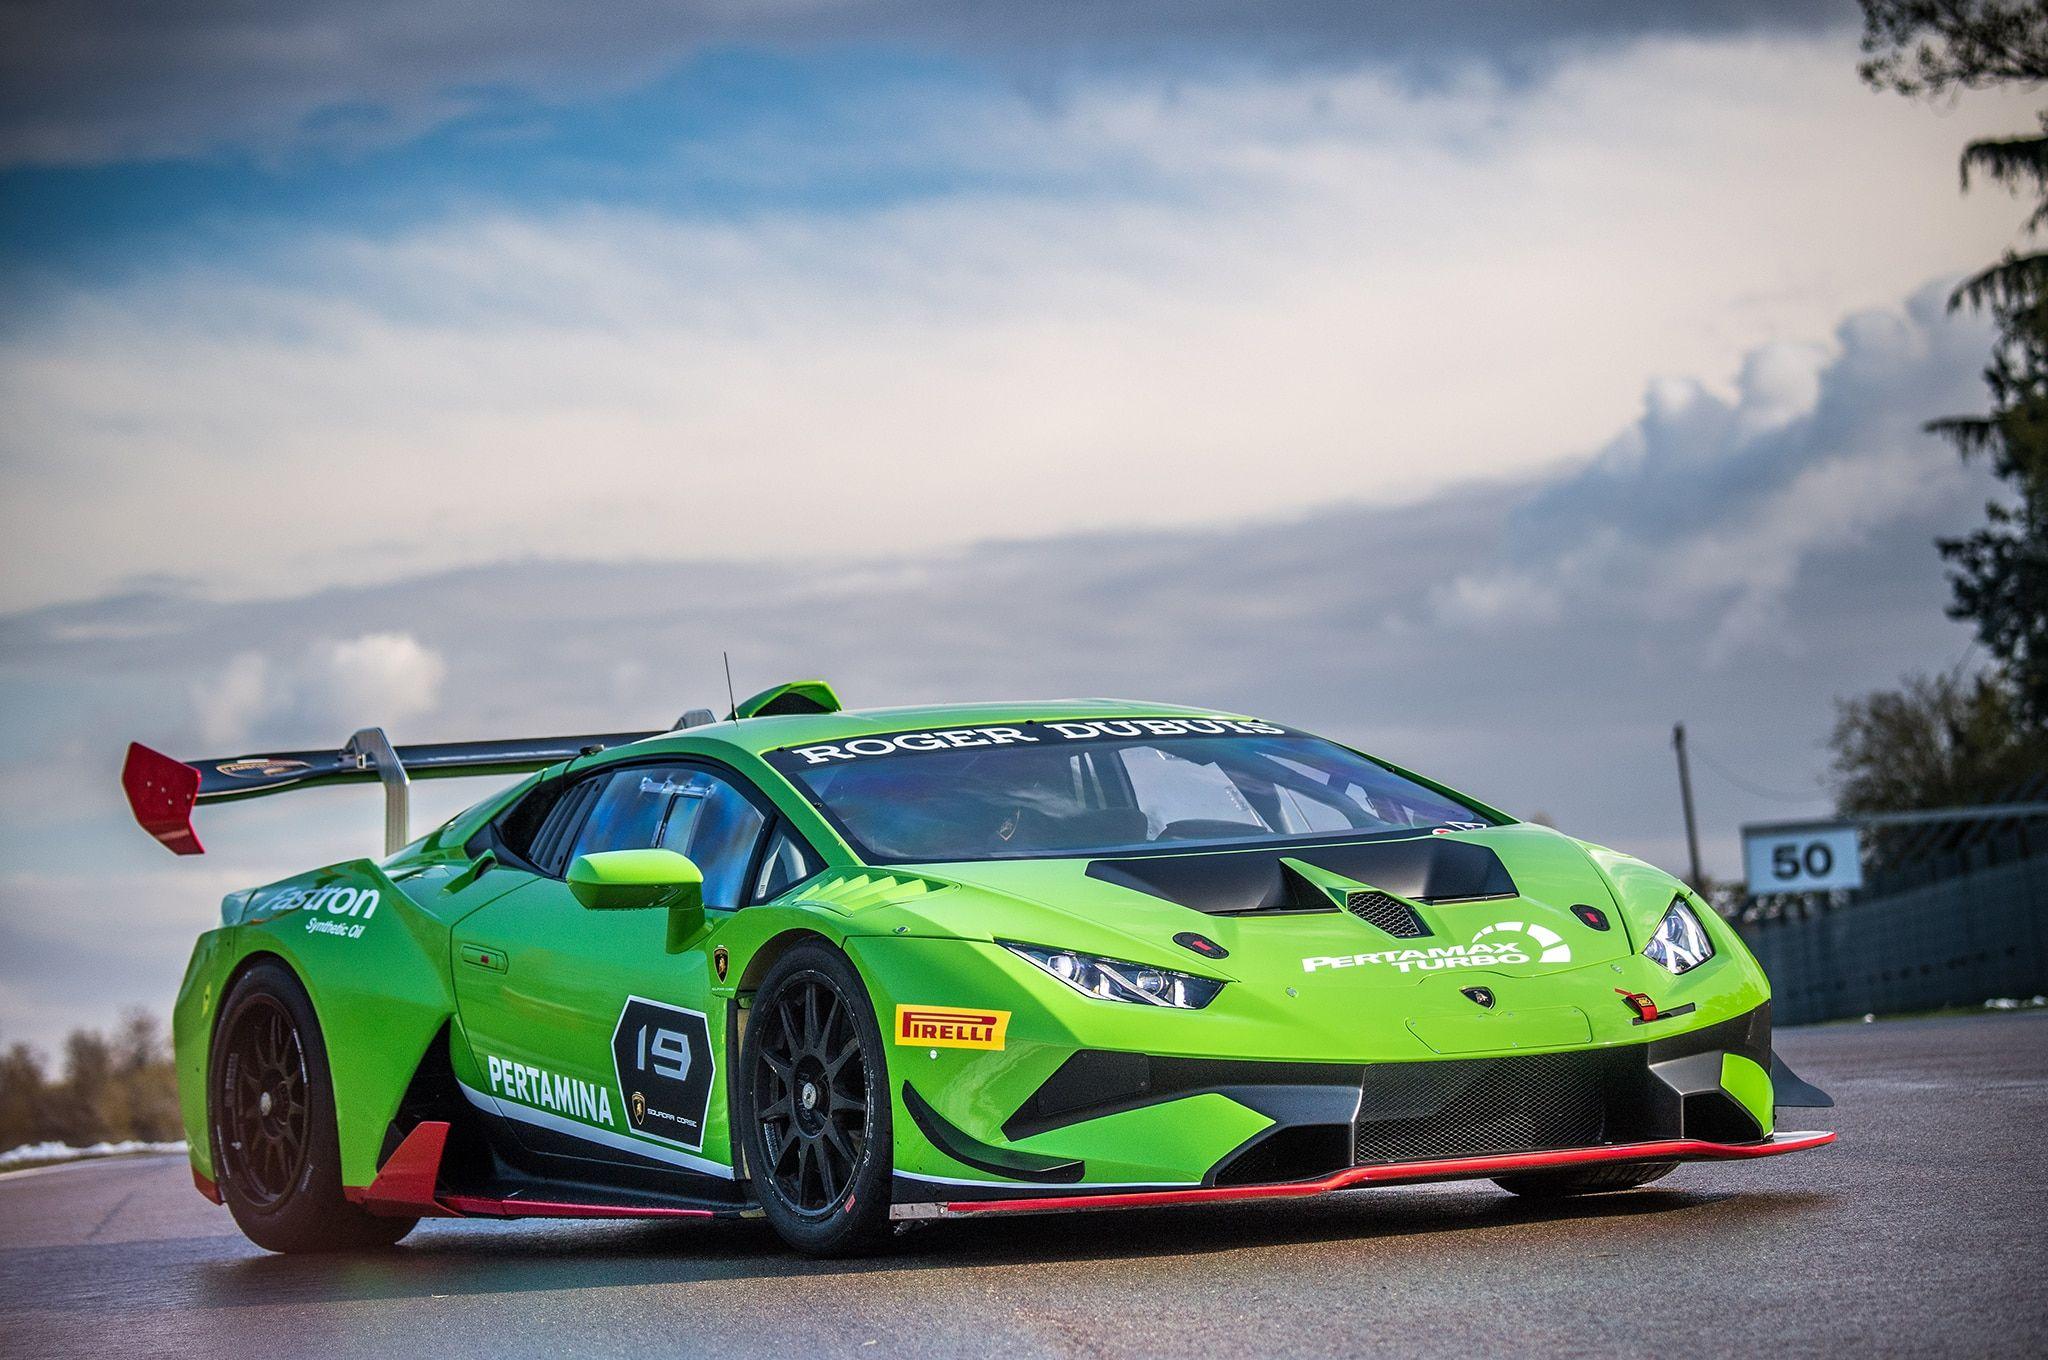 Image Result For Lamborghini Lamborghini Fast Cars Dream Cars